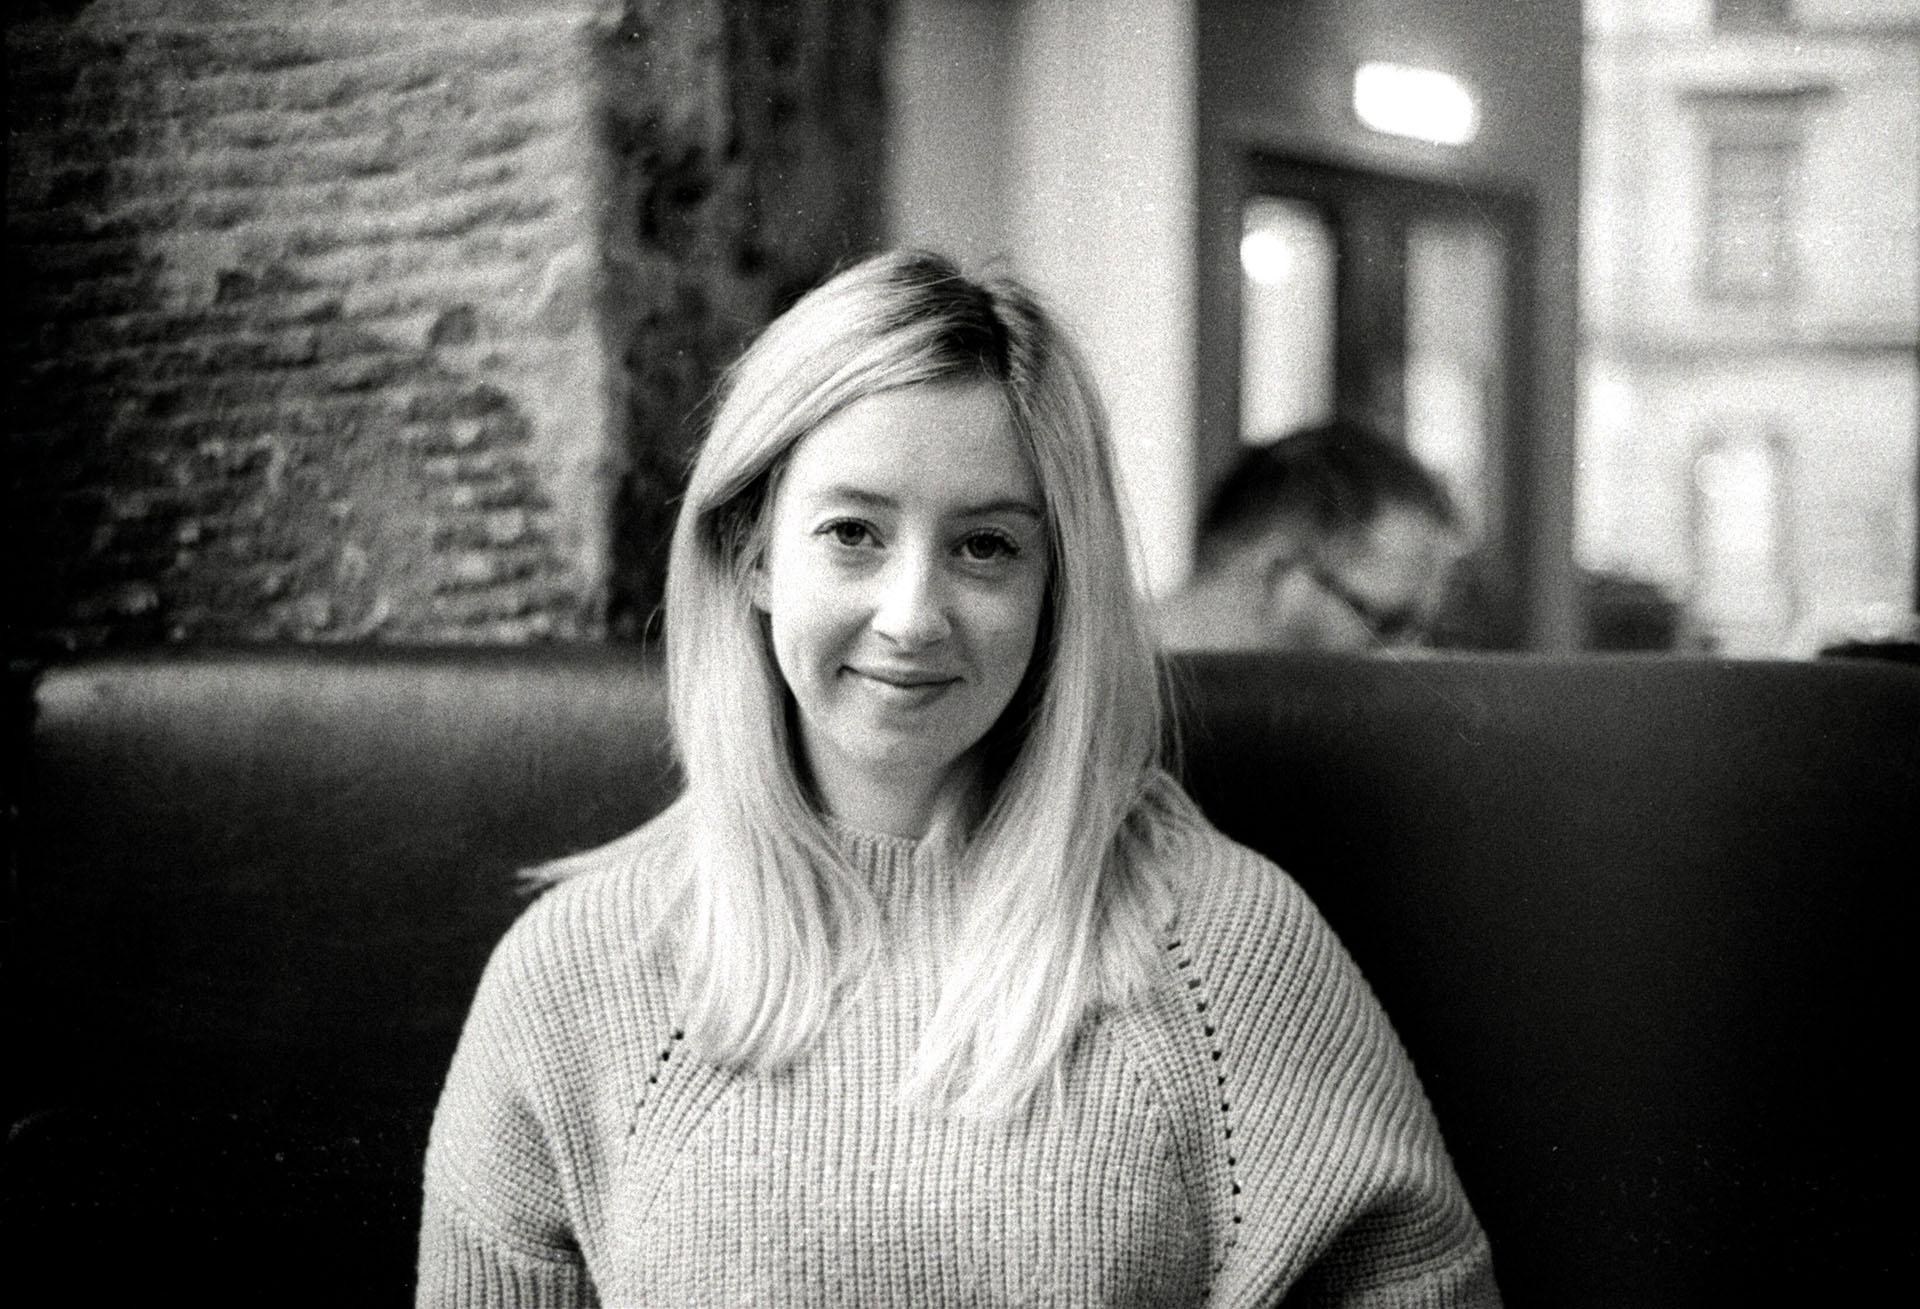 black and white film portrait